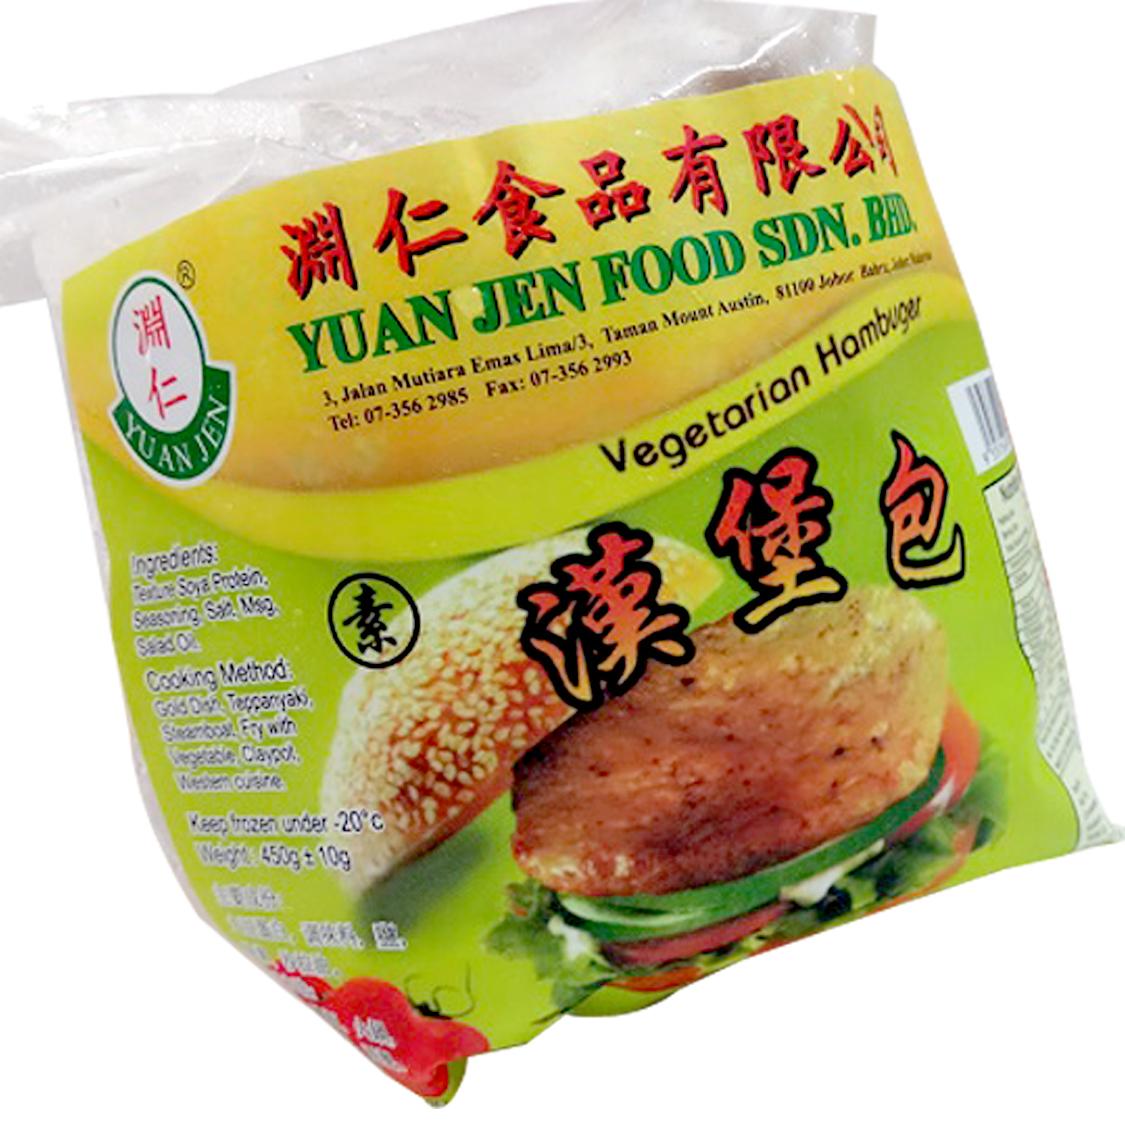 Image Vege Hamburger 渊仁 - 汉堡包 450grams